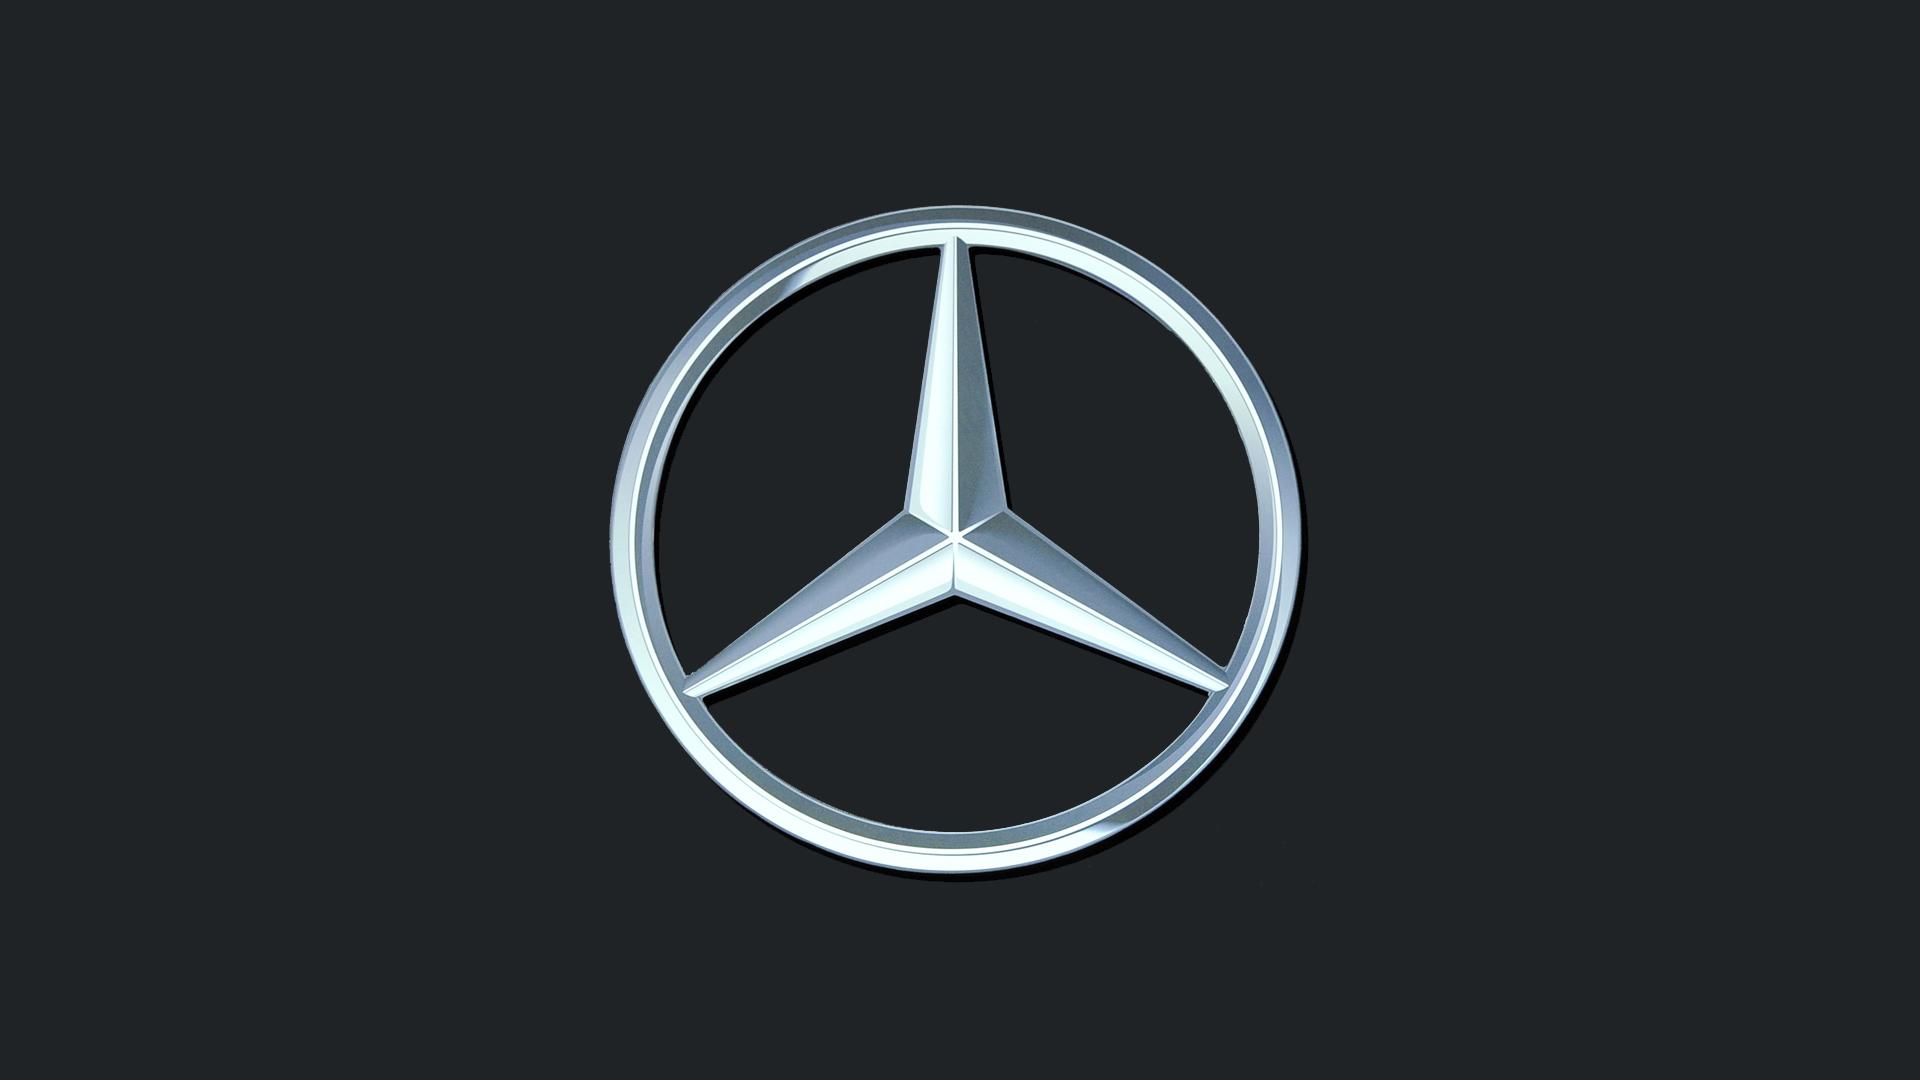 Mercedes Benz 1920x1080